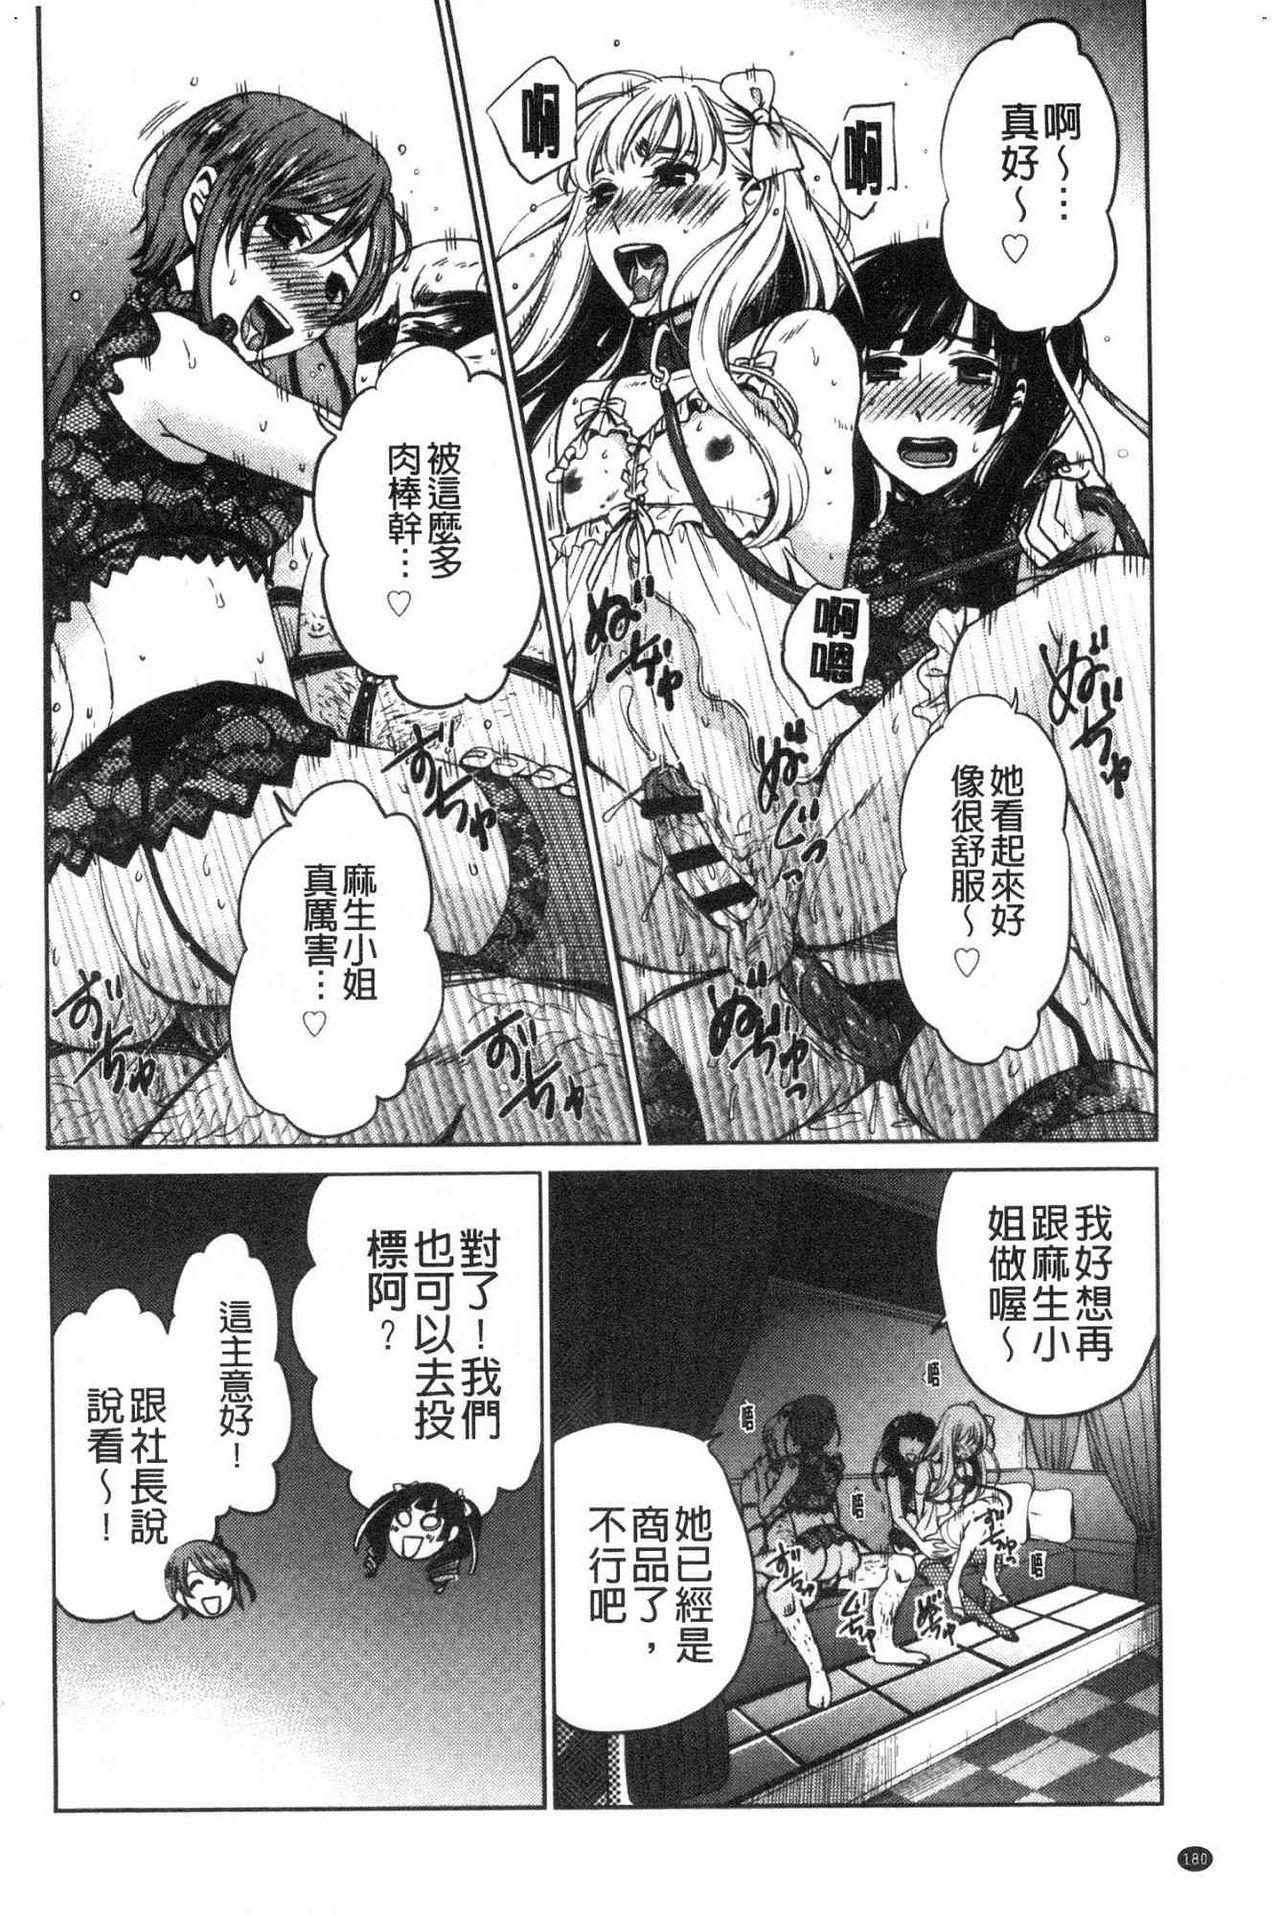 [Gotoh Akira]  21-ji no Onna ~Camera no Mae no Mesuinu~ 2 | 21時之女 ~鏡頭前的牝犬~ 2 [Chinese] 181